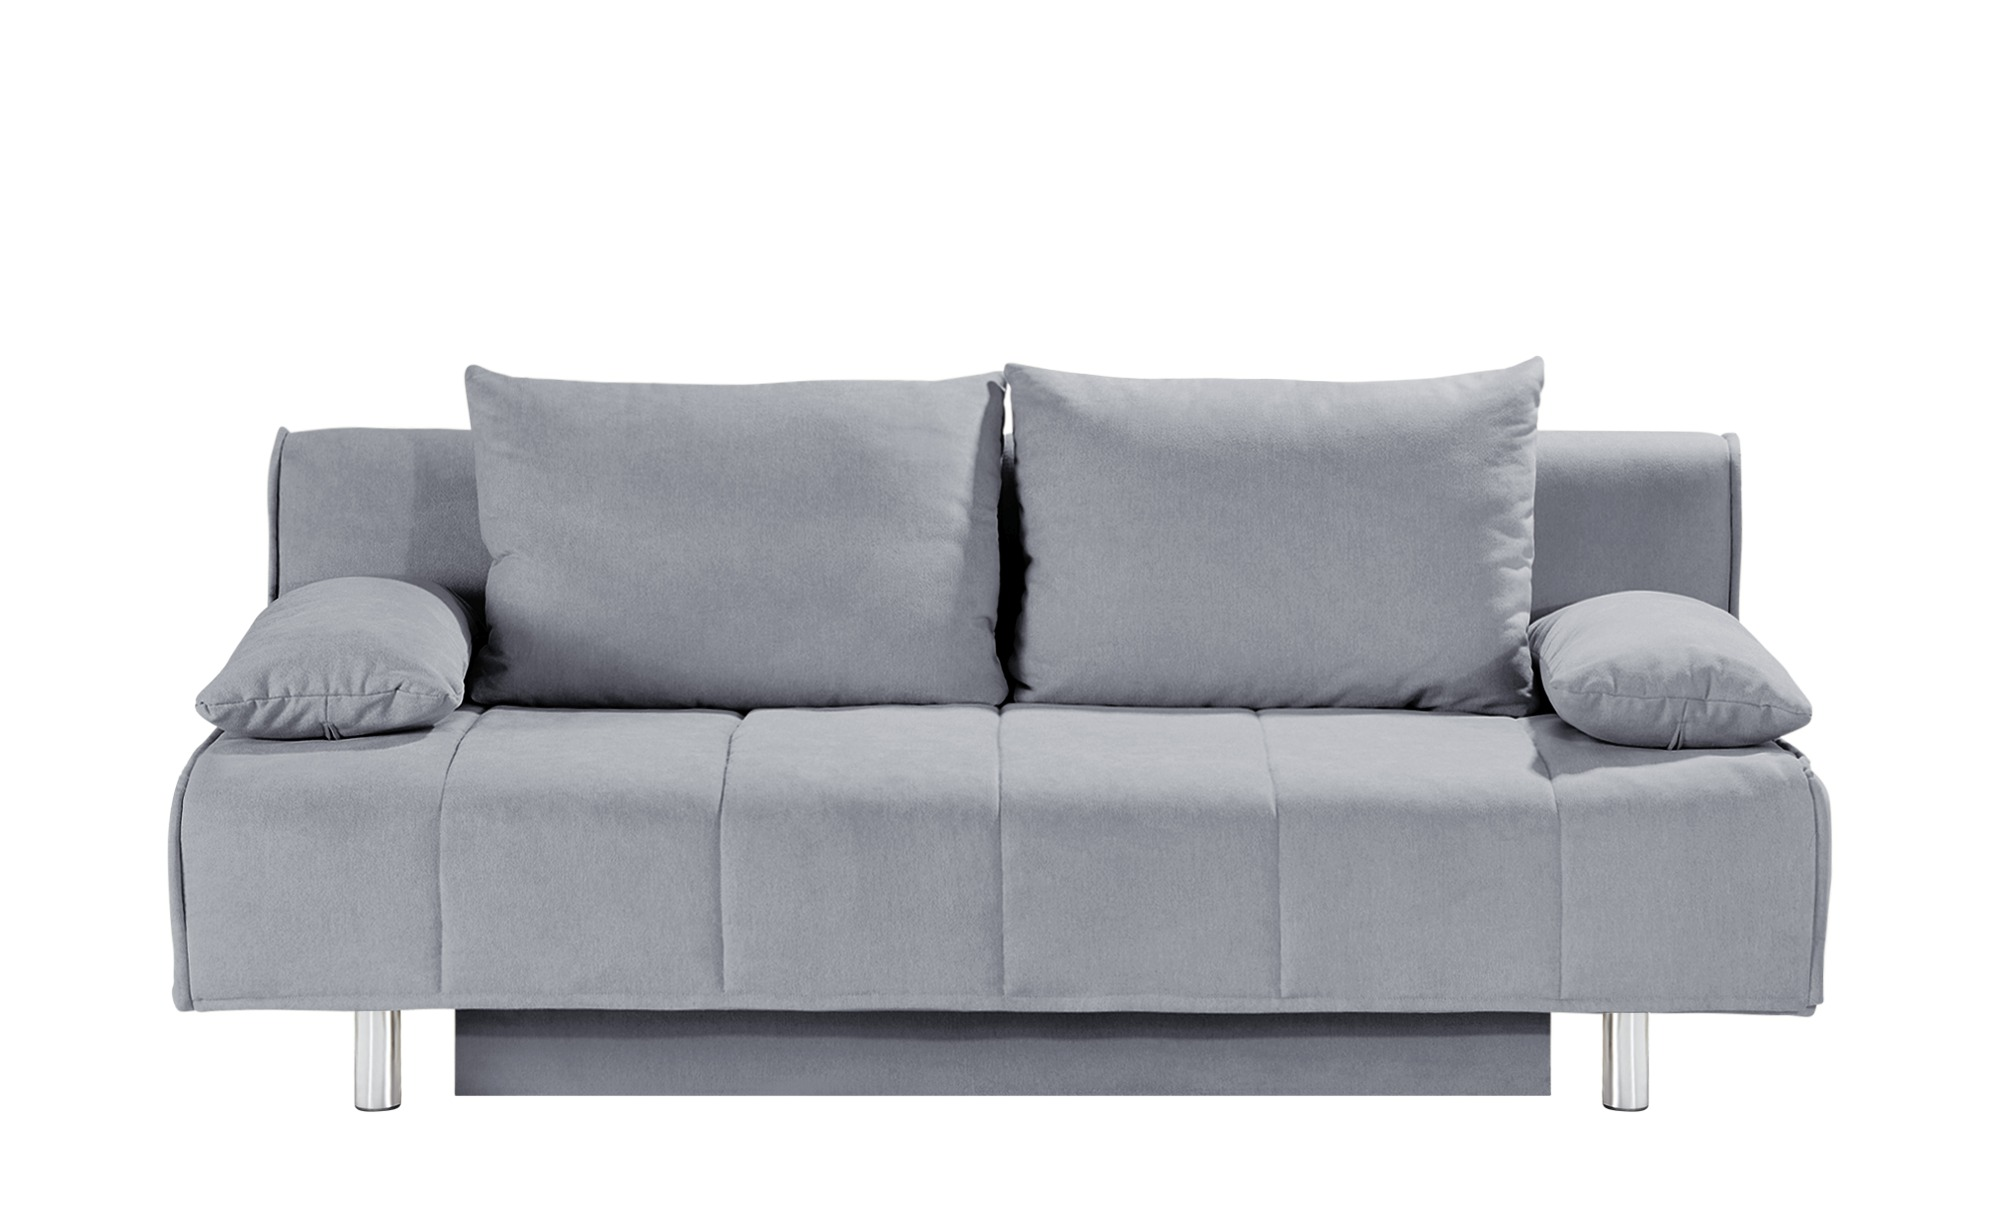 smart Schlafsofa grau - Webstoff Alina ¦ grau ¦ Maße (cm): B: 200 H: 90 T: 100 Polstermöbel > Sofas > 2-Sitzer - Höffner